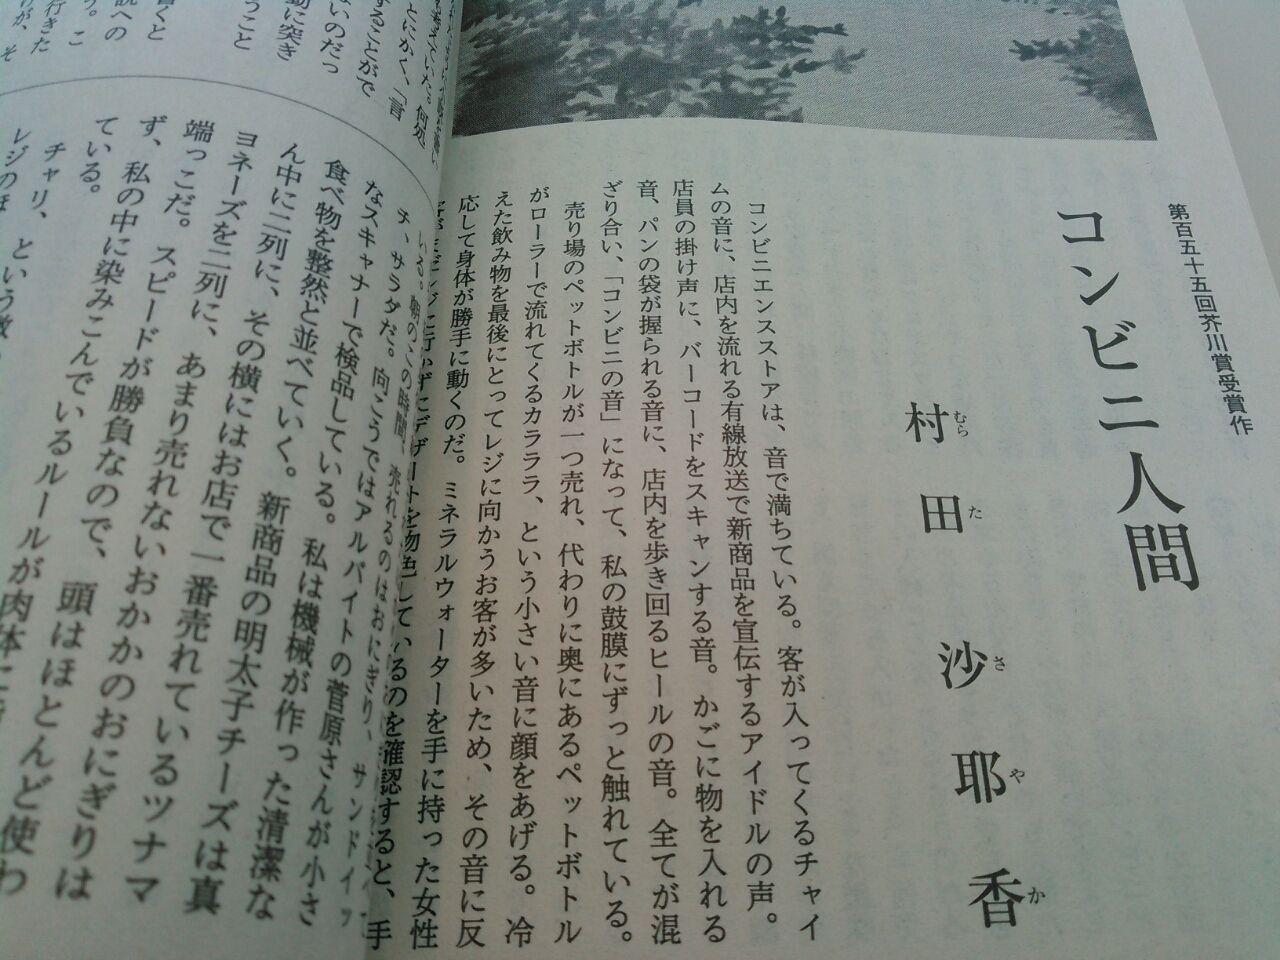 鈴木康友 (野球)の画像 p1_21